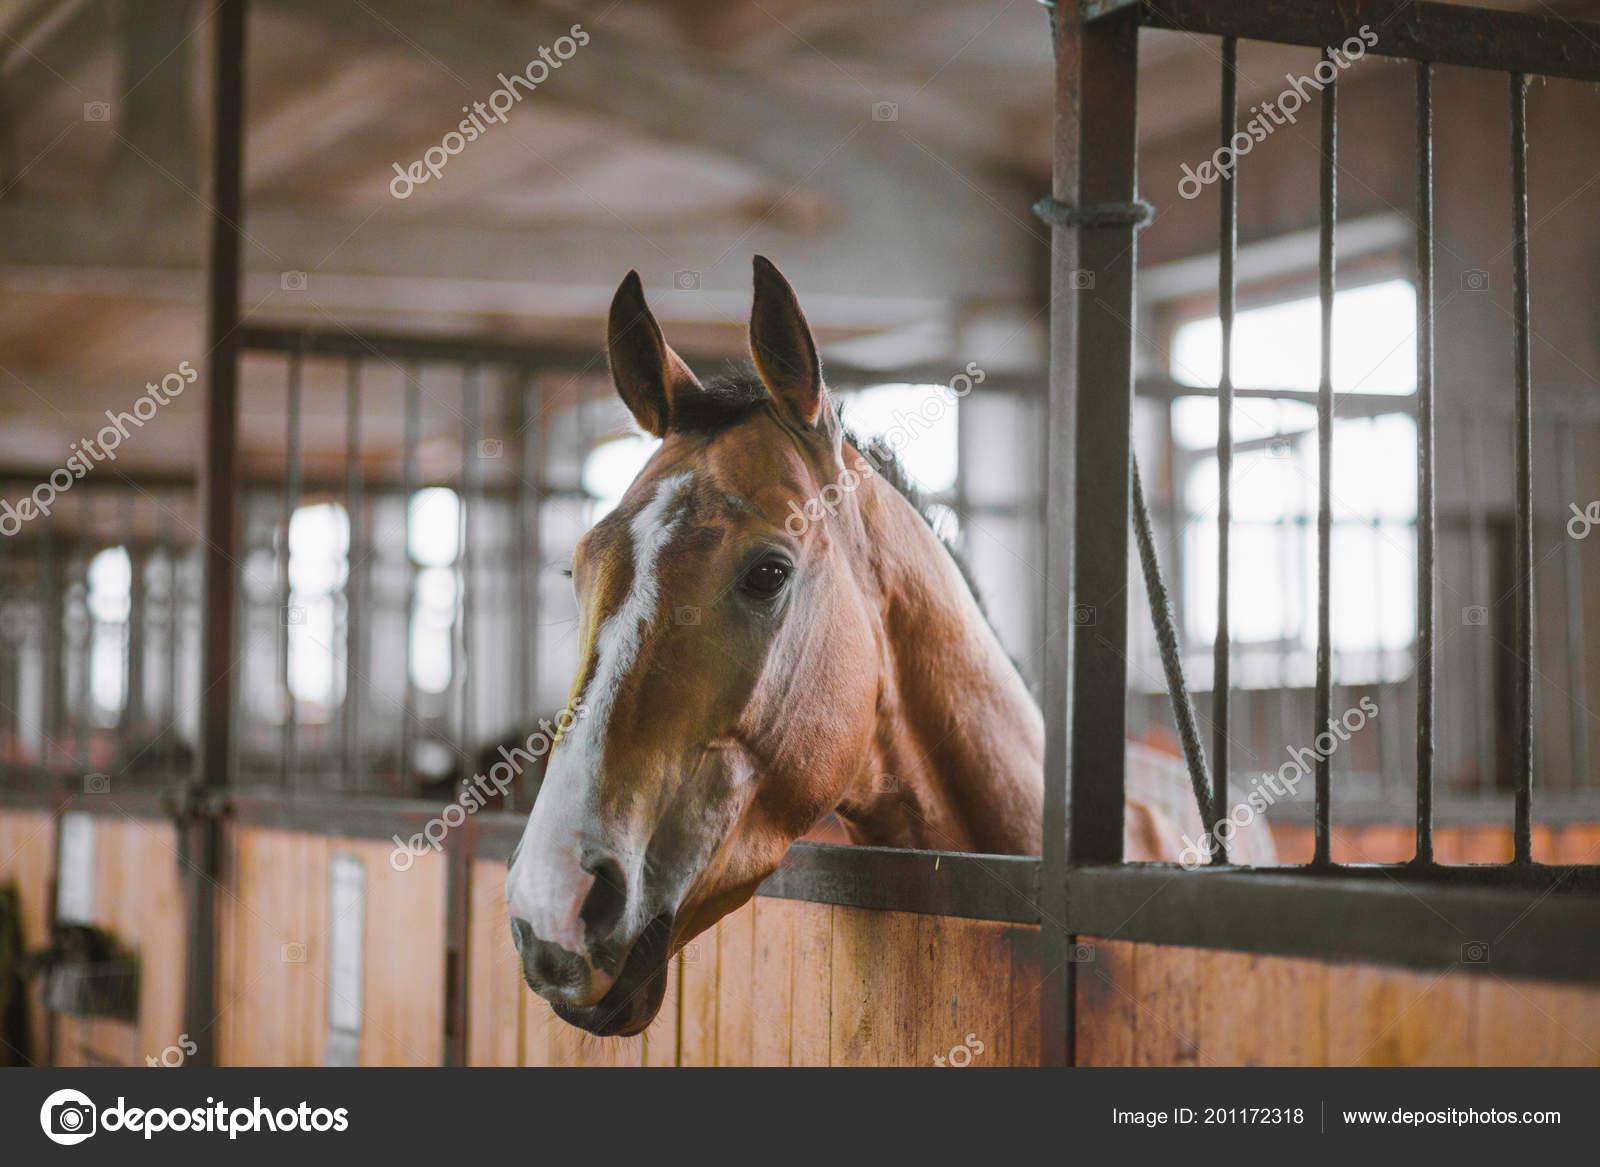 Beautiful Horses Animals Pasture Stables Horseback Riding Stock Photo C Vitizh 201172318